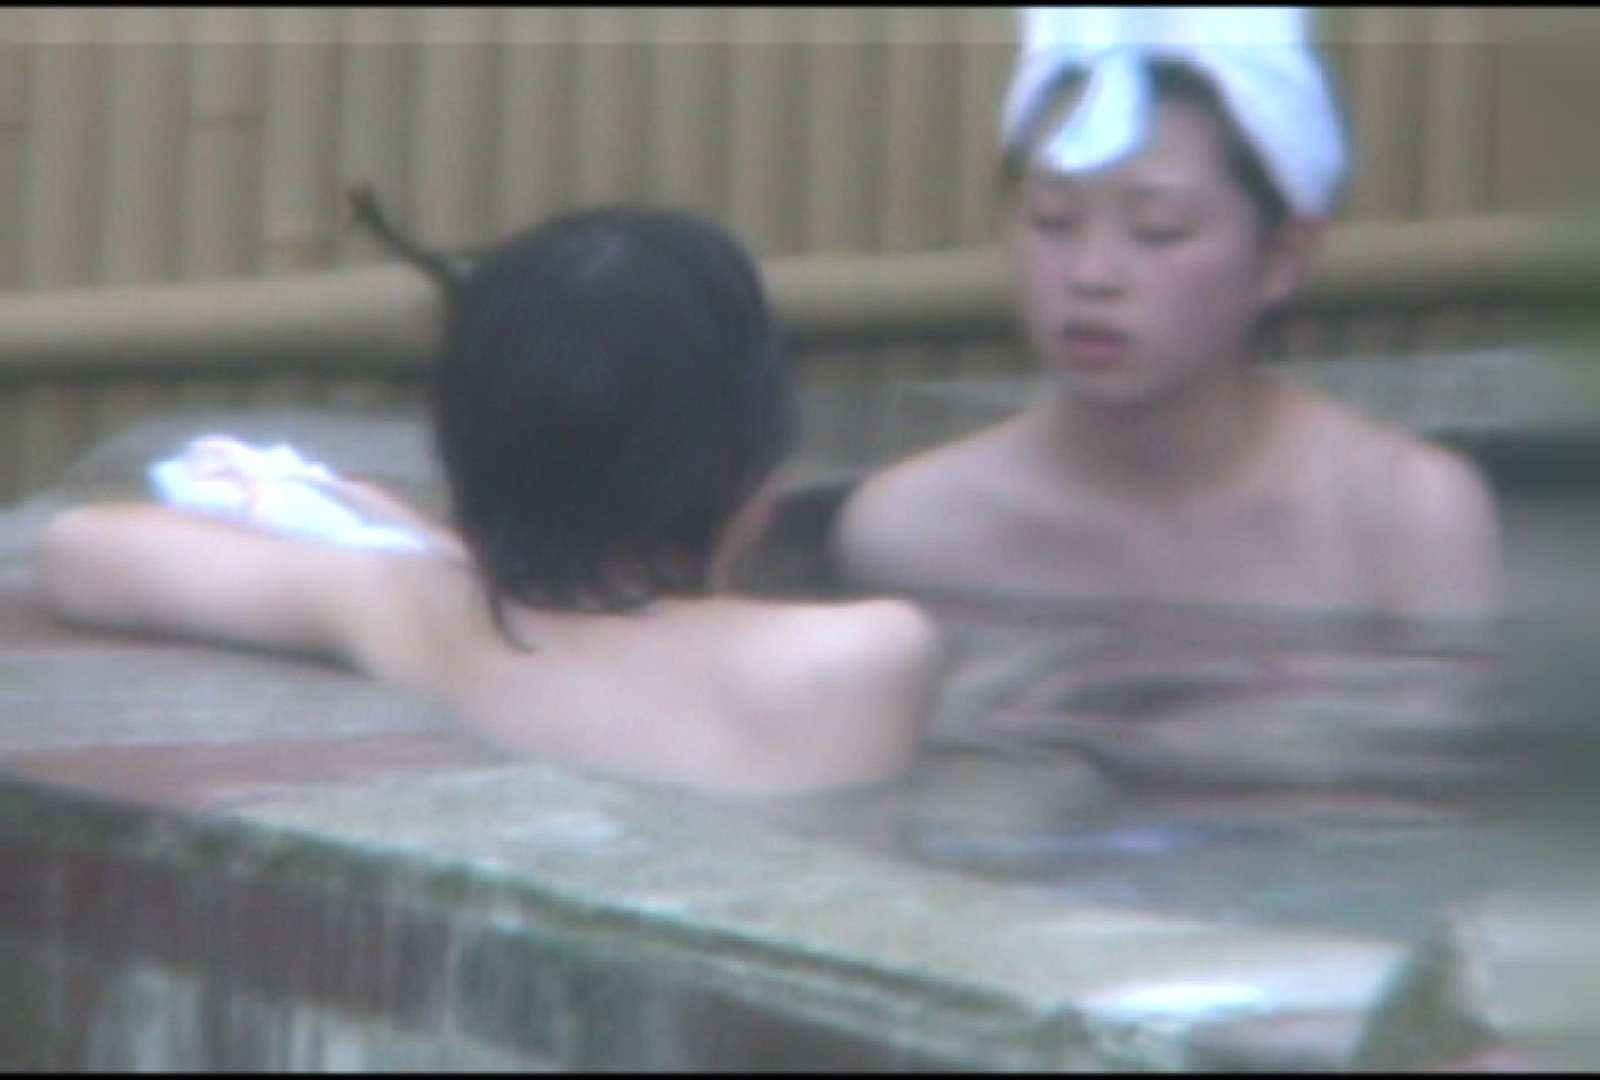 Aquaな露天風呂Vol.146 盗撮映像  73Pix 65